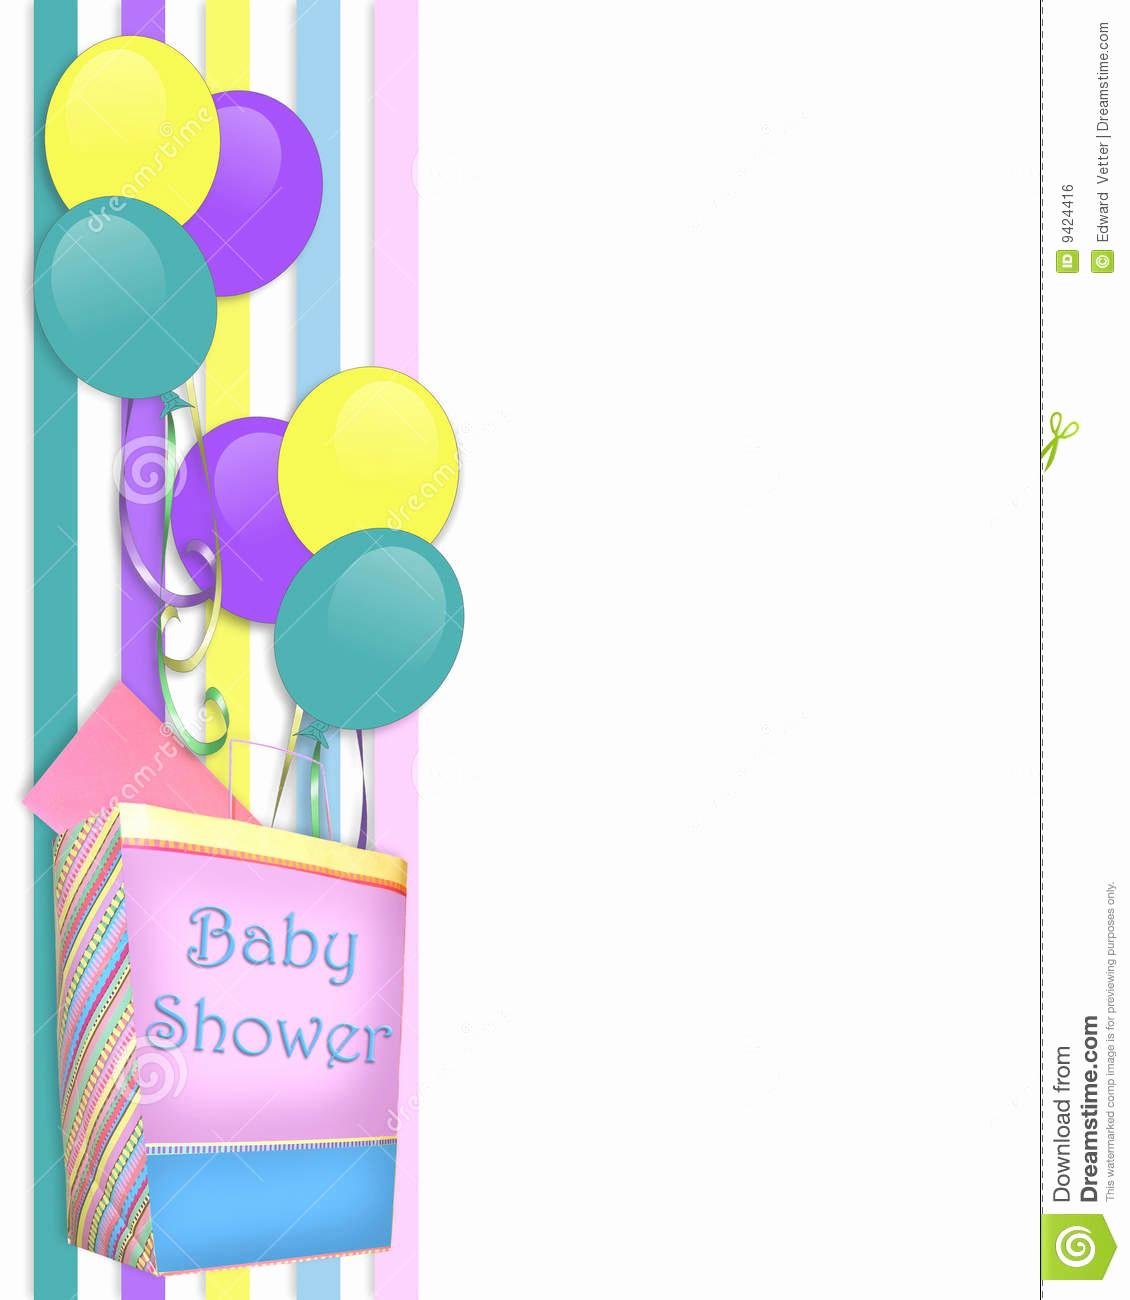 Baby Shower Invitation Border Fresh Invitation Borders Clipart